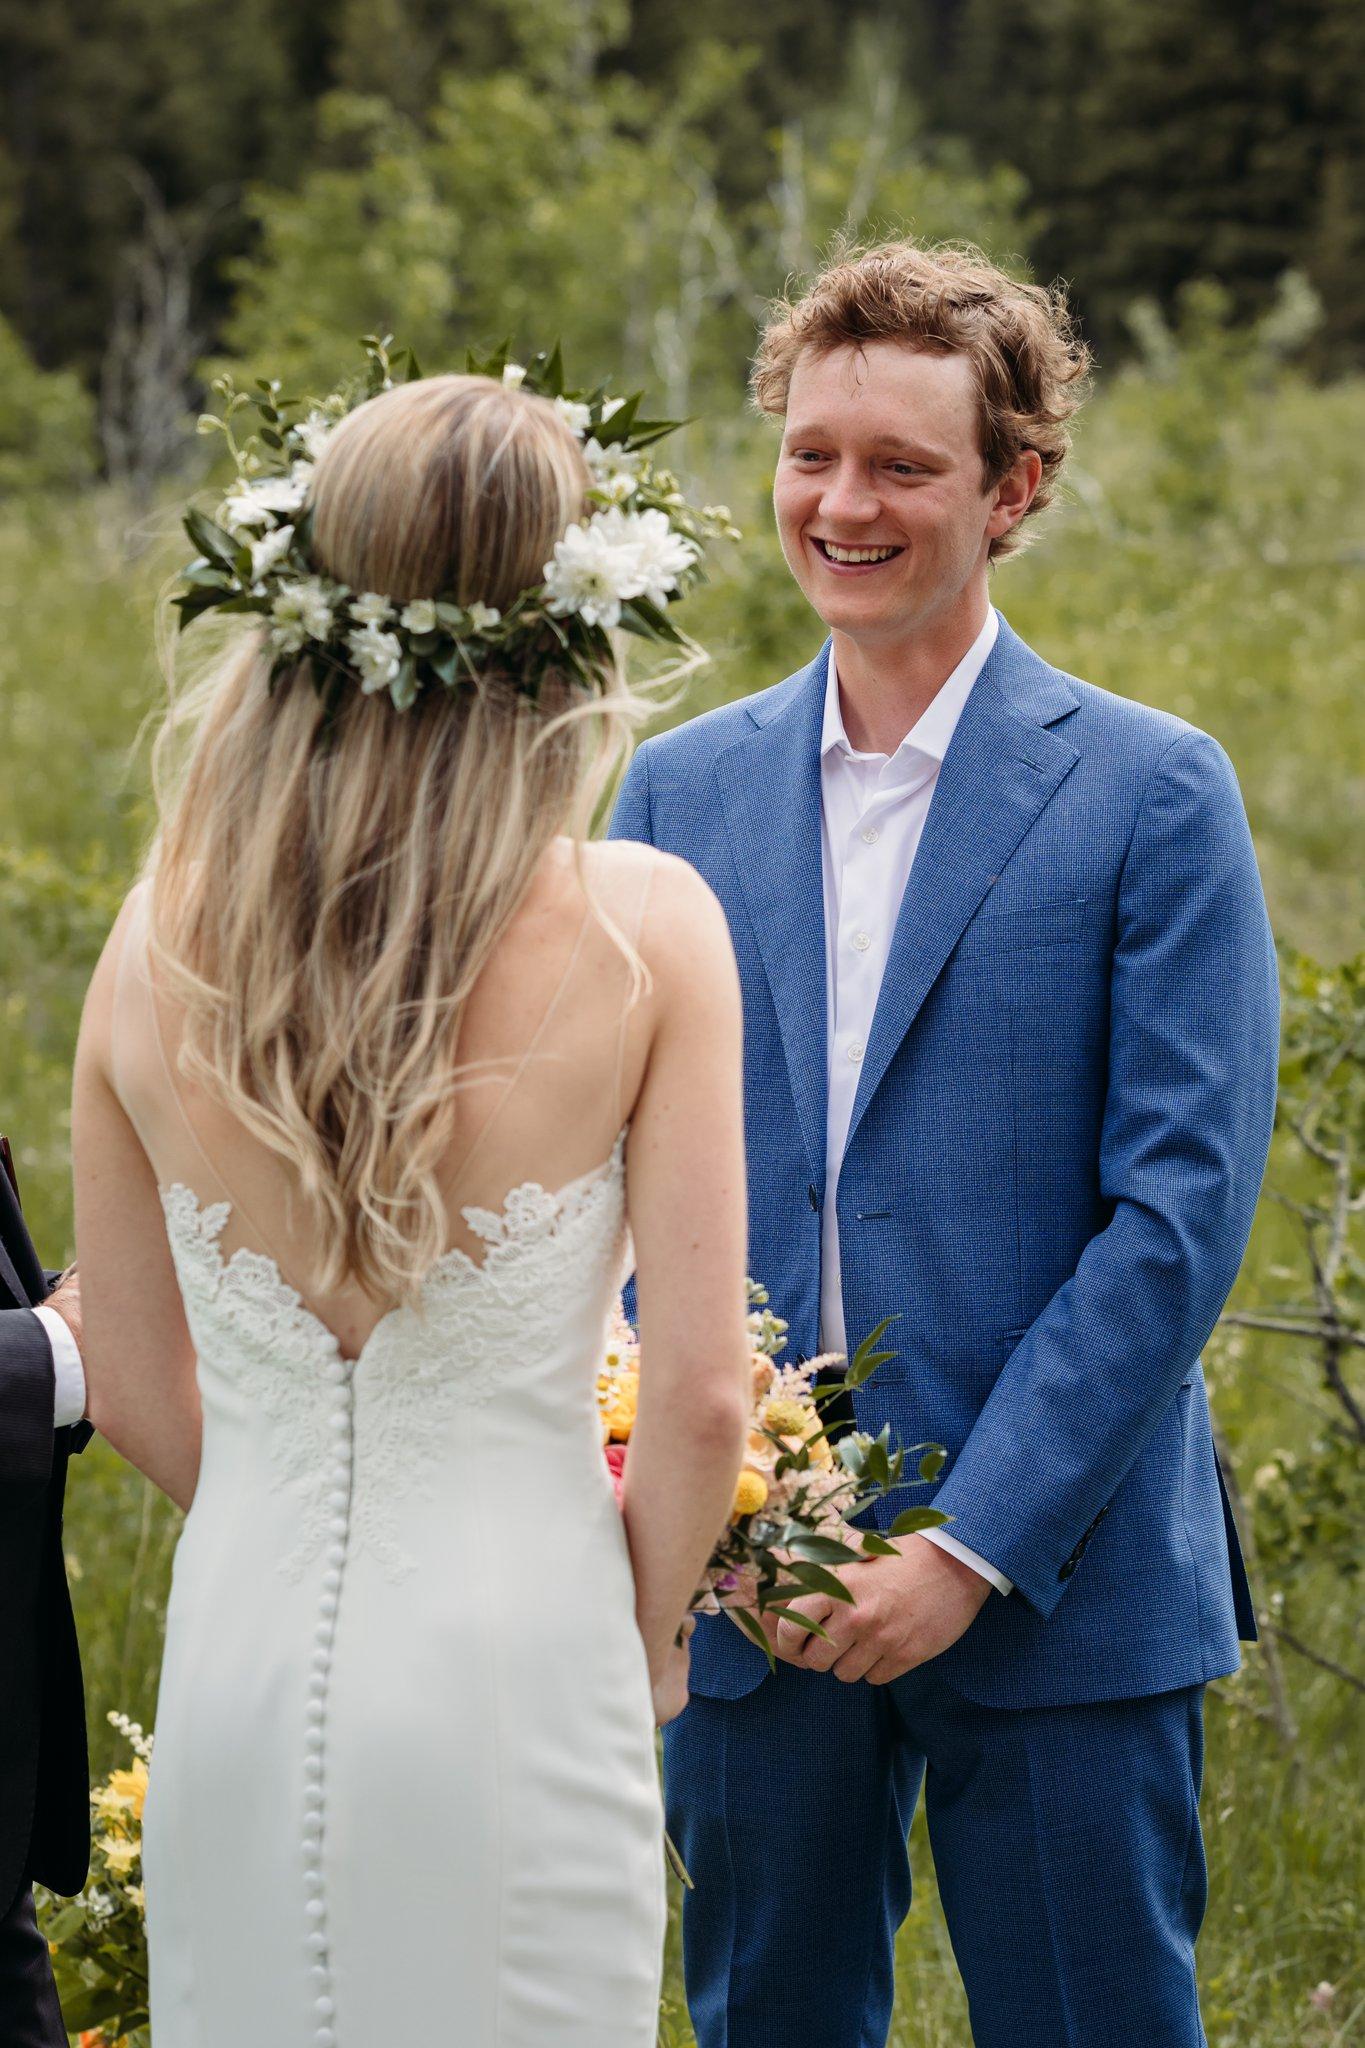 Ashley Daphne Photography,Calgary wedding photographer,Castle Provincial Park,Wedding Photography,cabin wedding,rustic wedding,small intimate wedding,wedding photographer,yyc wedding photographer,